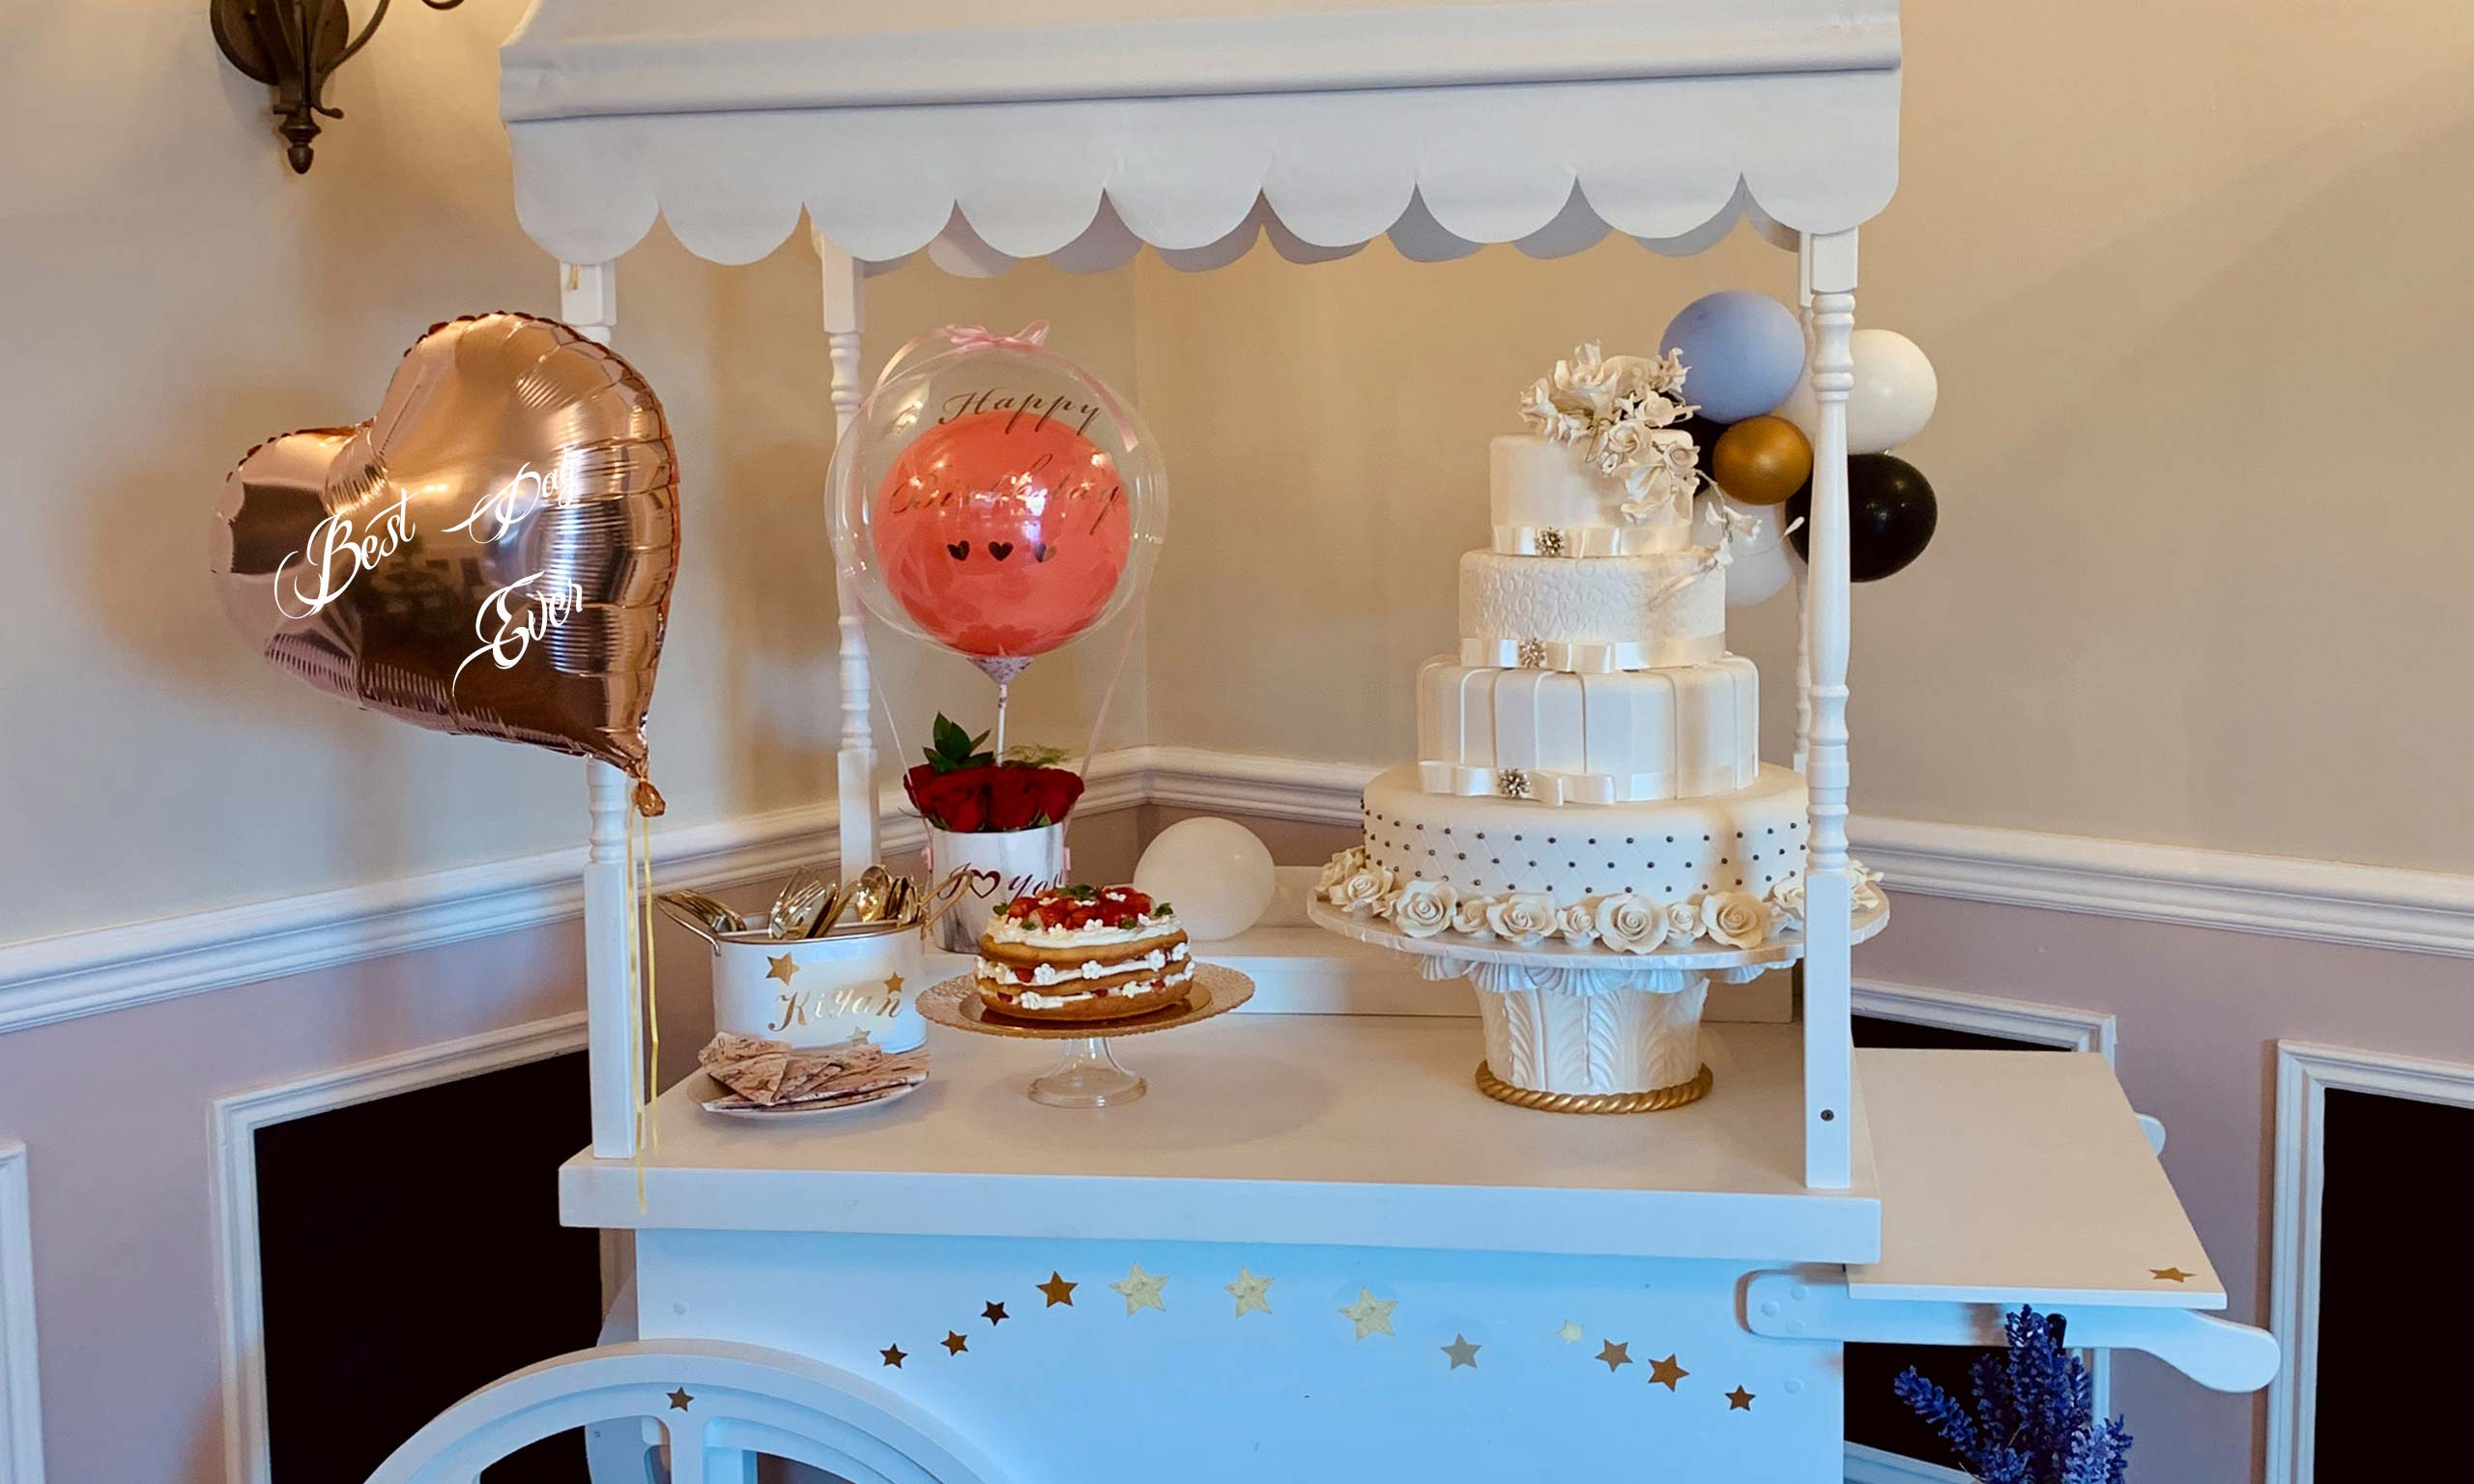 BALLOONS_BIRTHDAY_CAKE_2